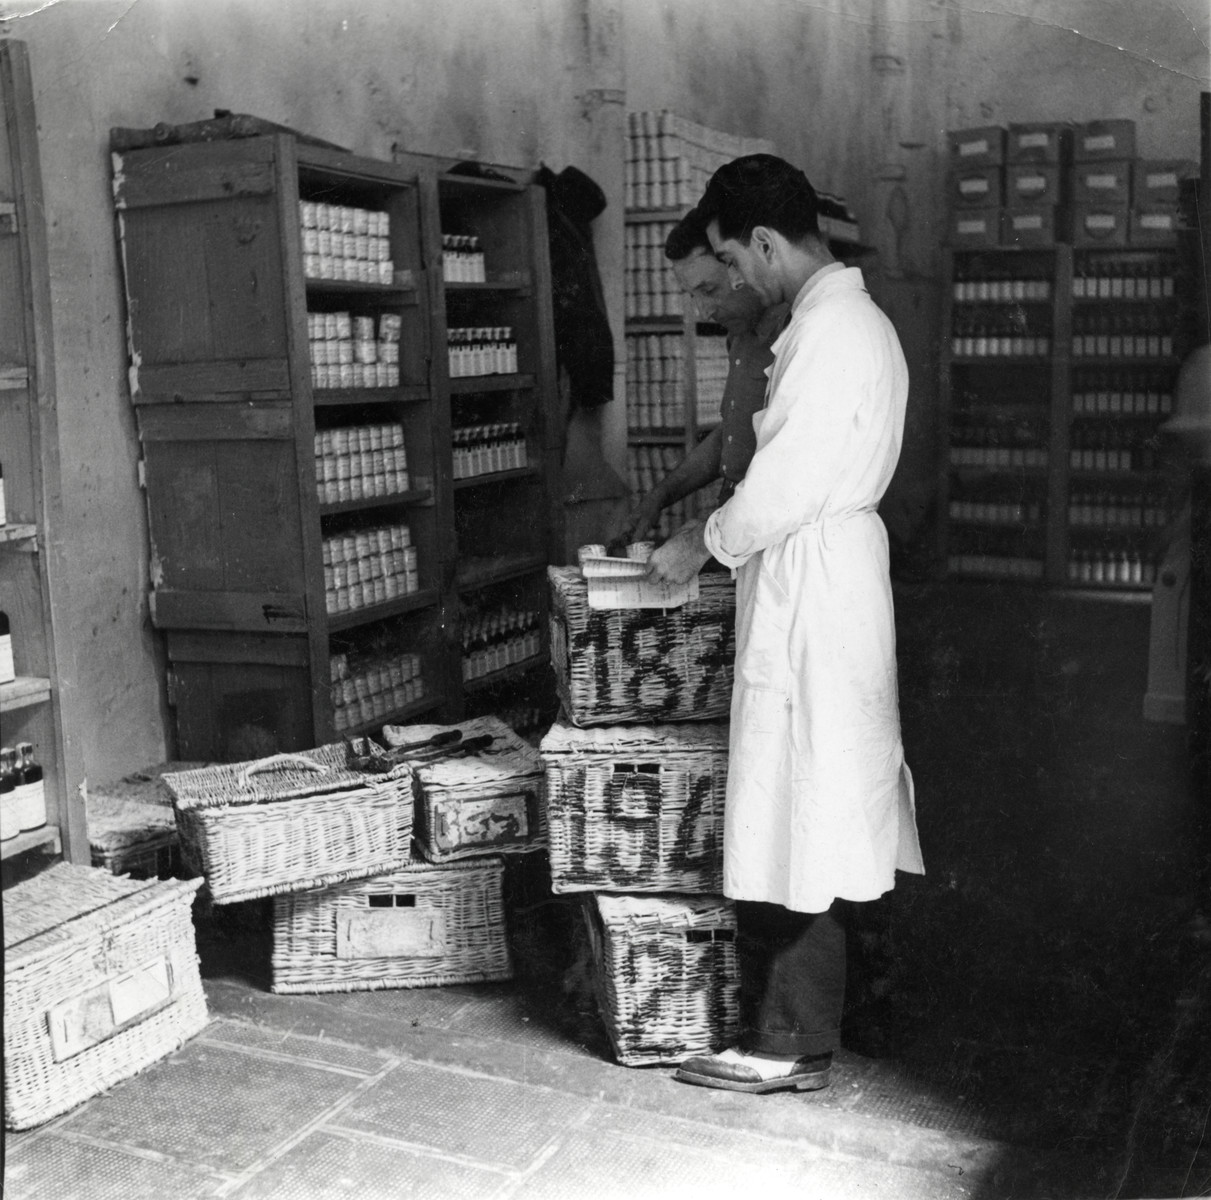 Josef Roger Cheraki works in a pharmacy in Algiers.